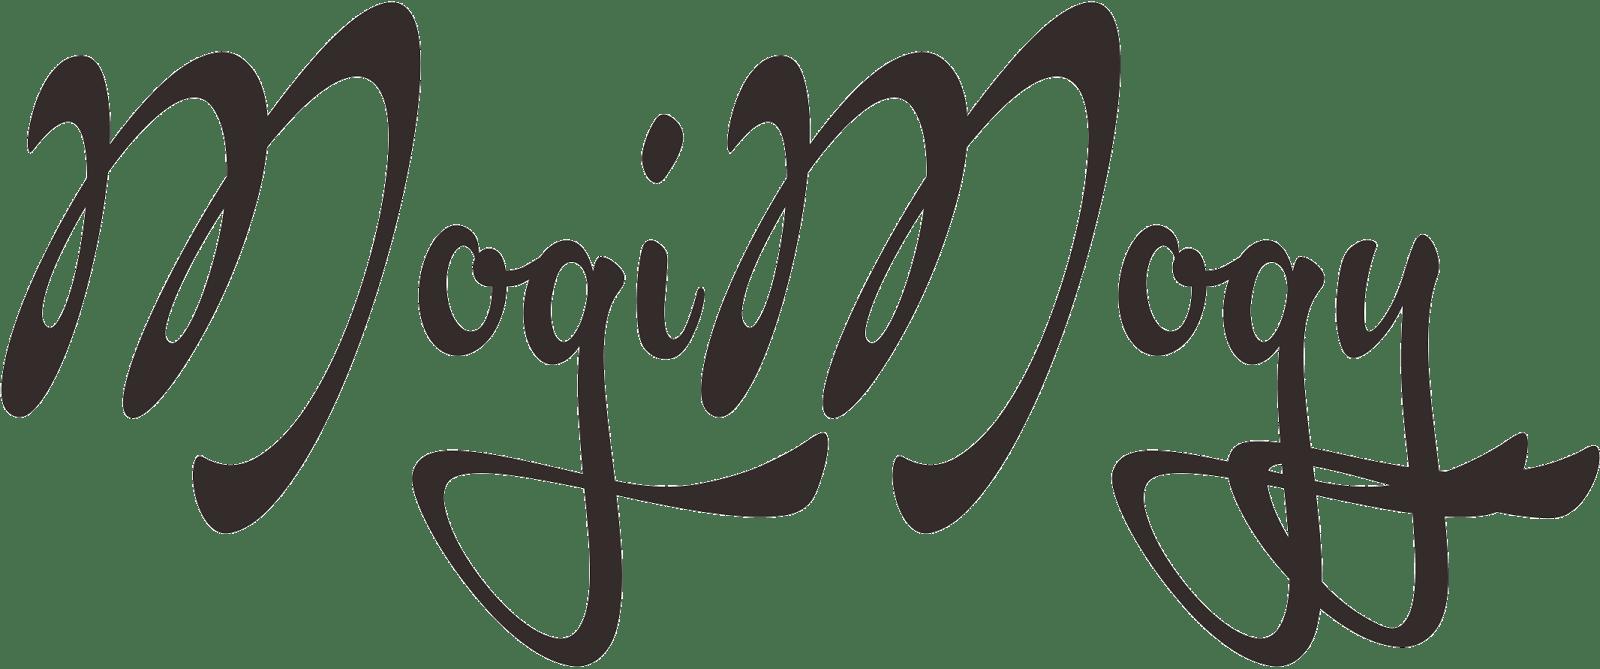 MogiMogy